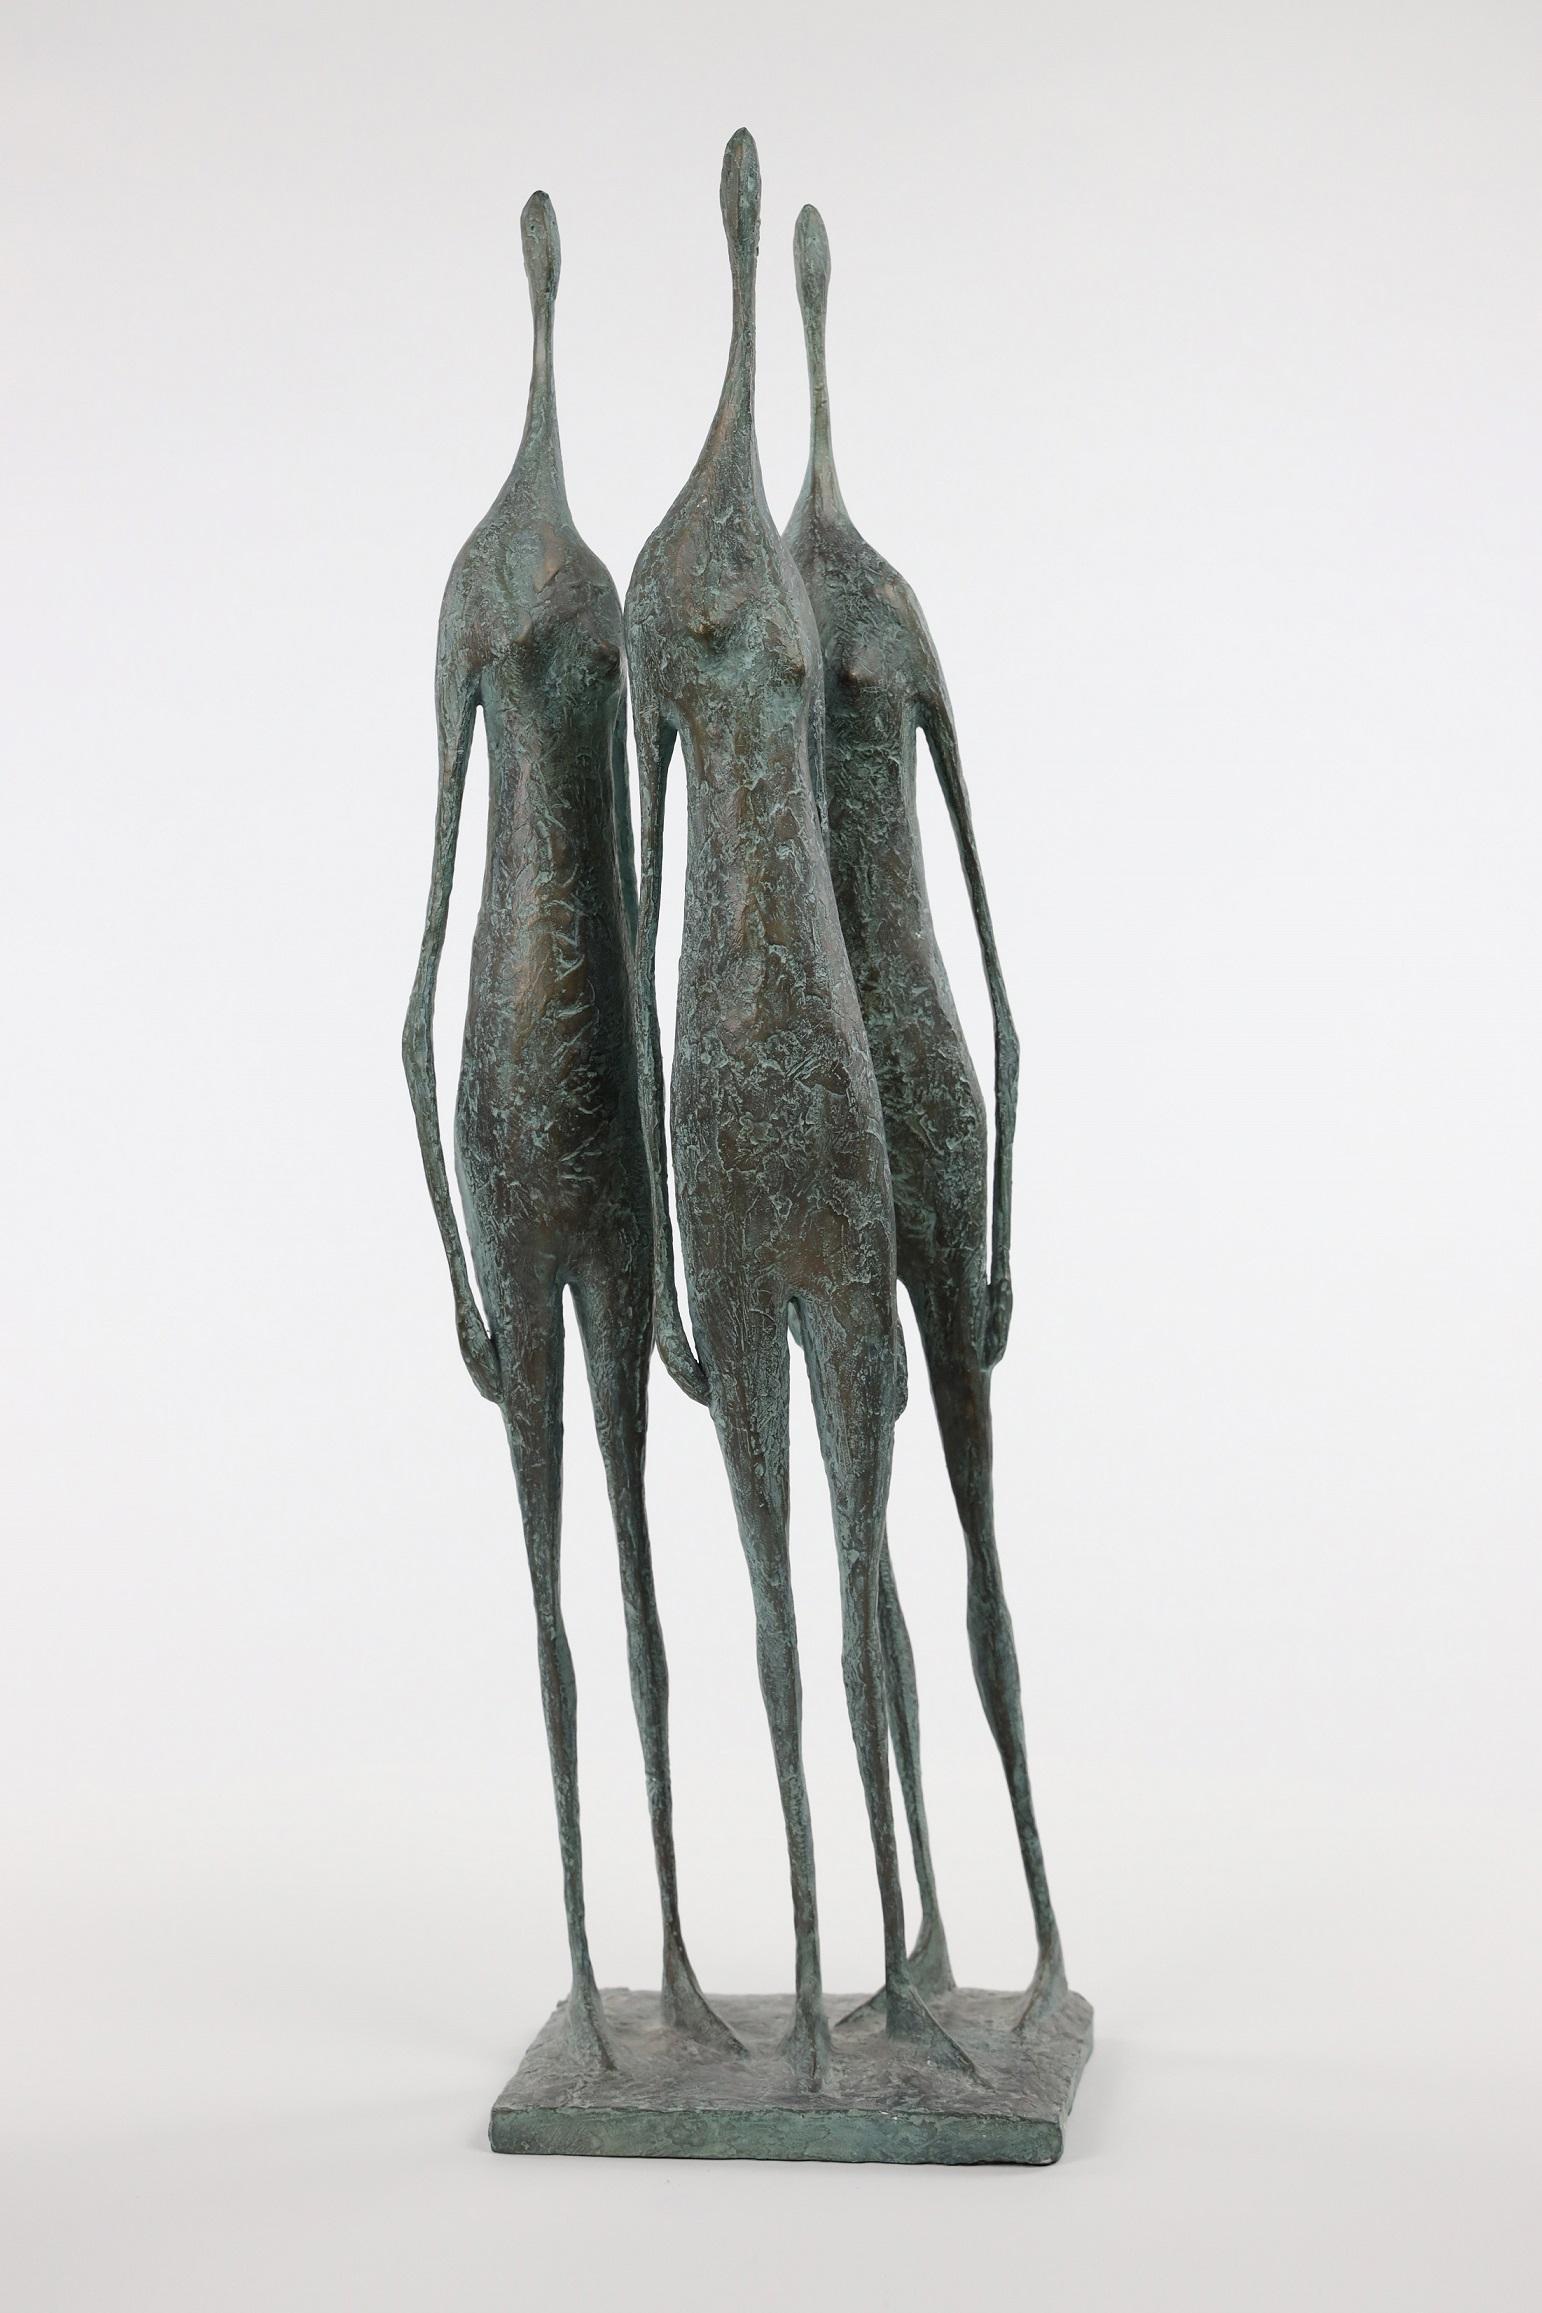 3 Standing Figures V - Bronze Group of Three Figures